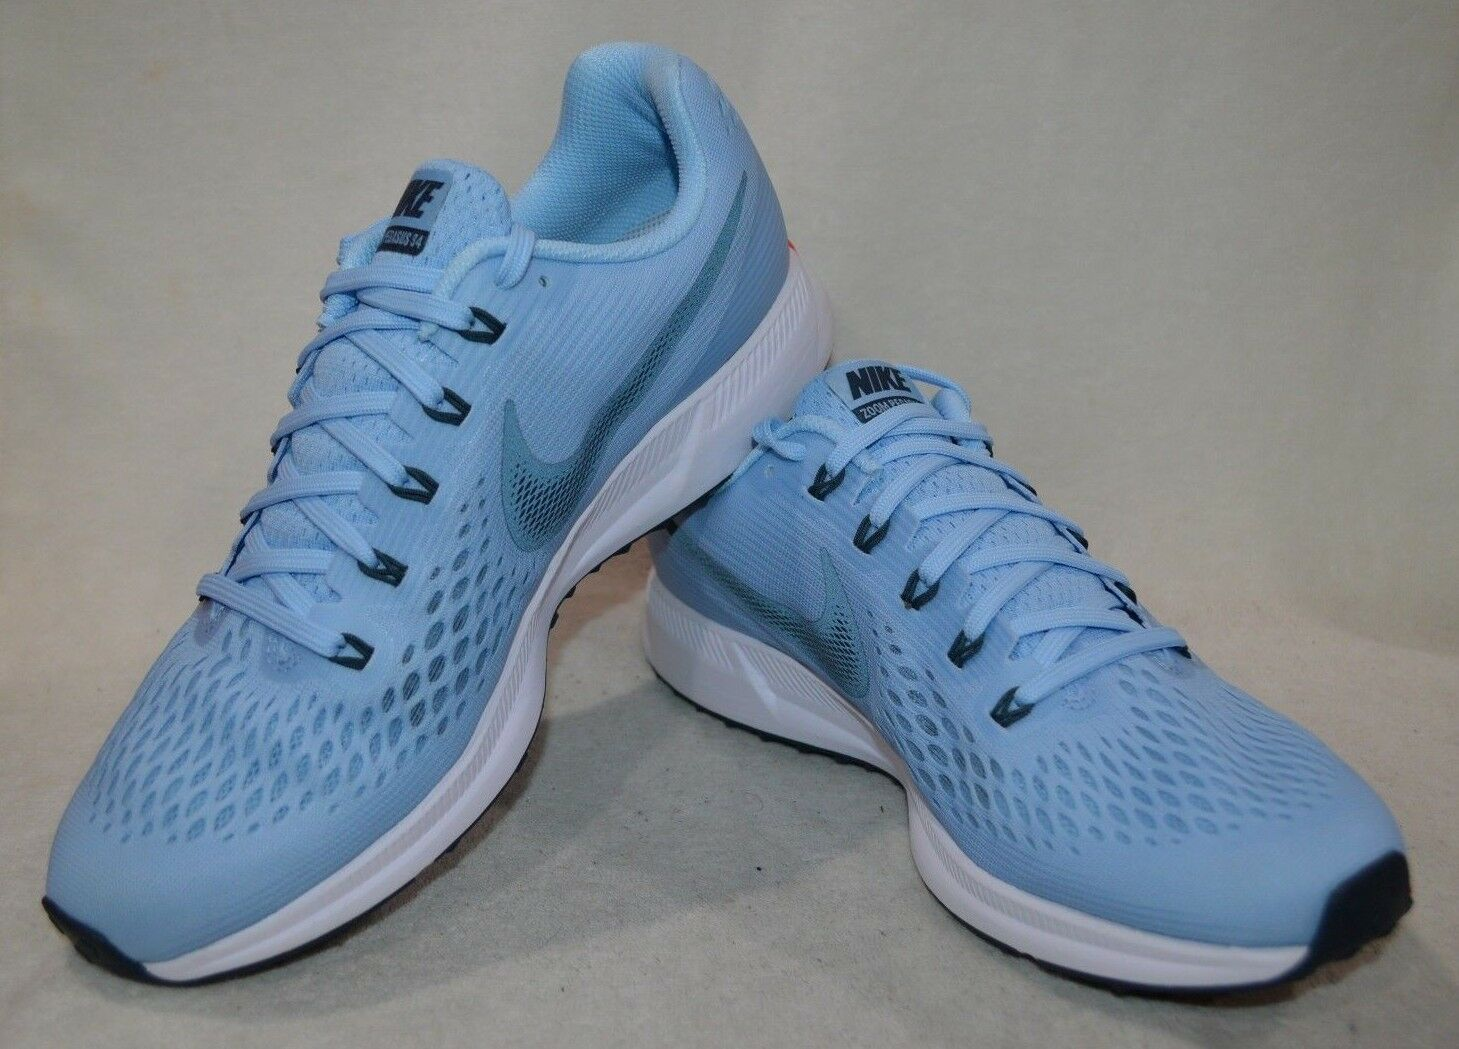 Nike Air Zoom Pegasus 34 Ice blu blu blu blu Fox Uomo Running scarpe-Dimensione 12 13 NWOB 929824